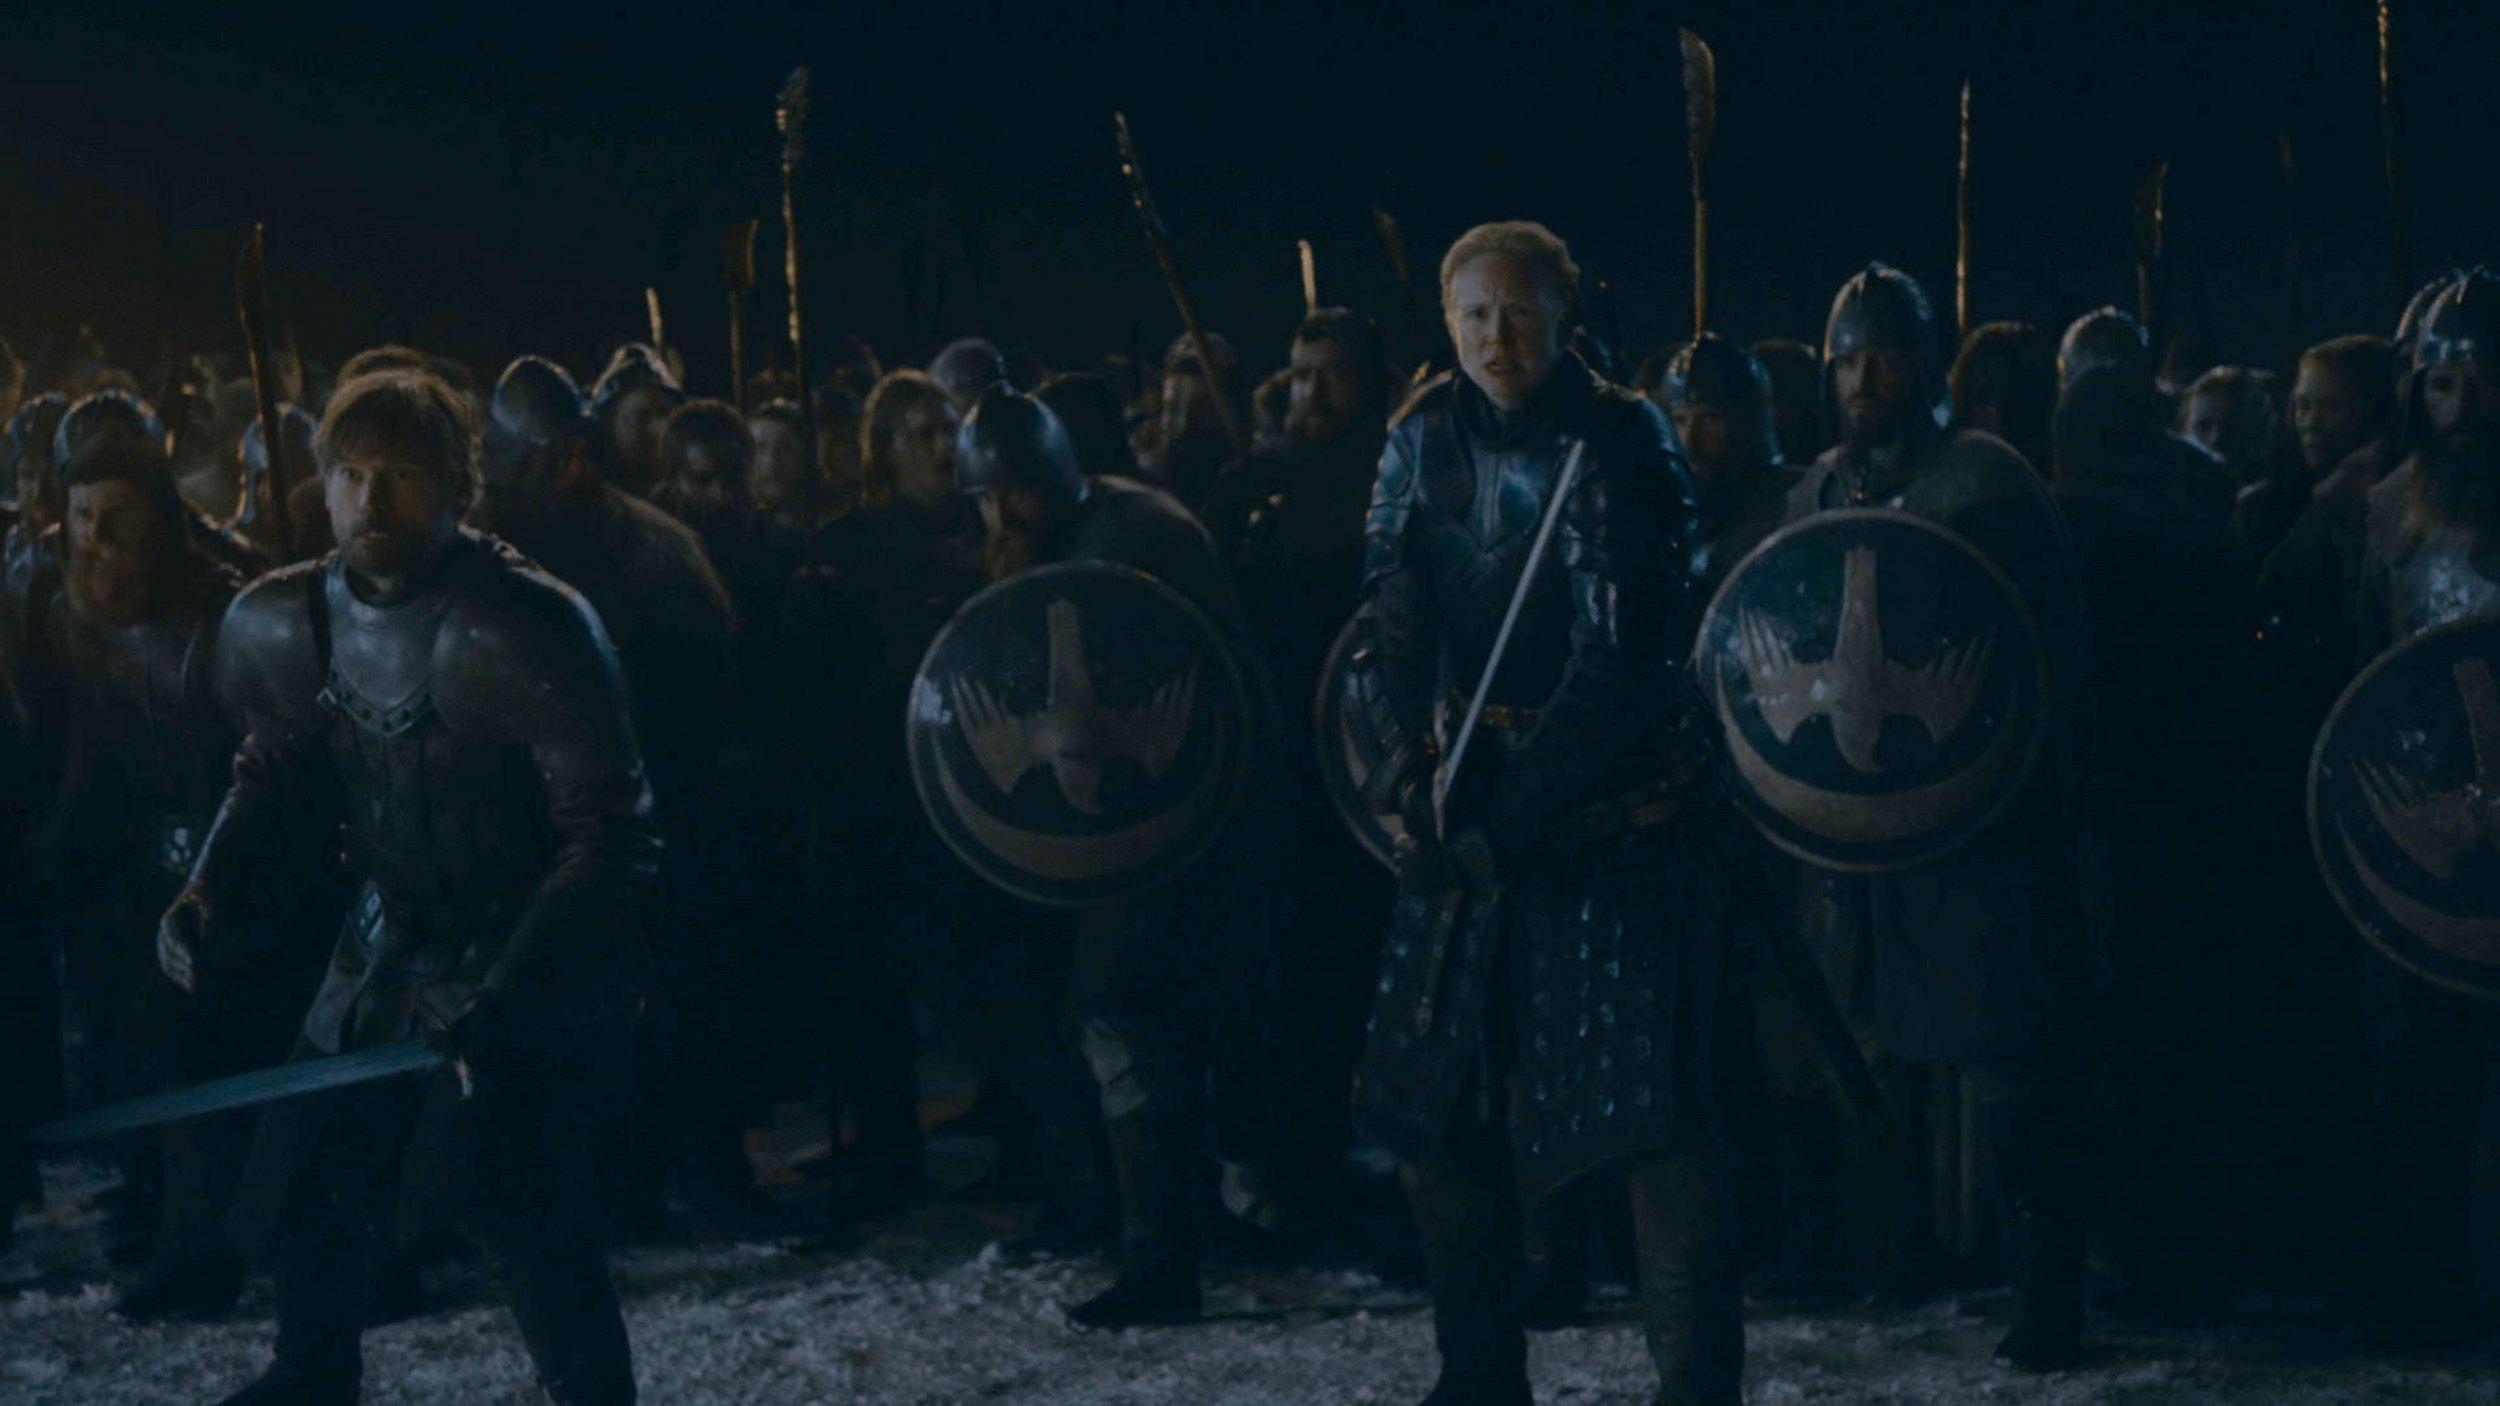 game of thrones battle of winterfell too dark